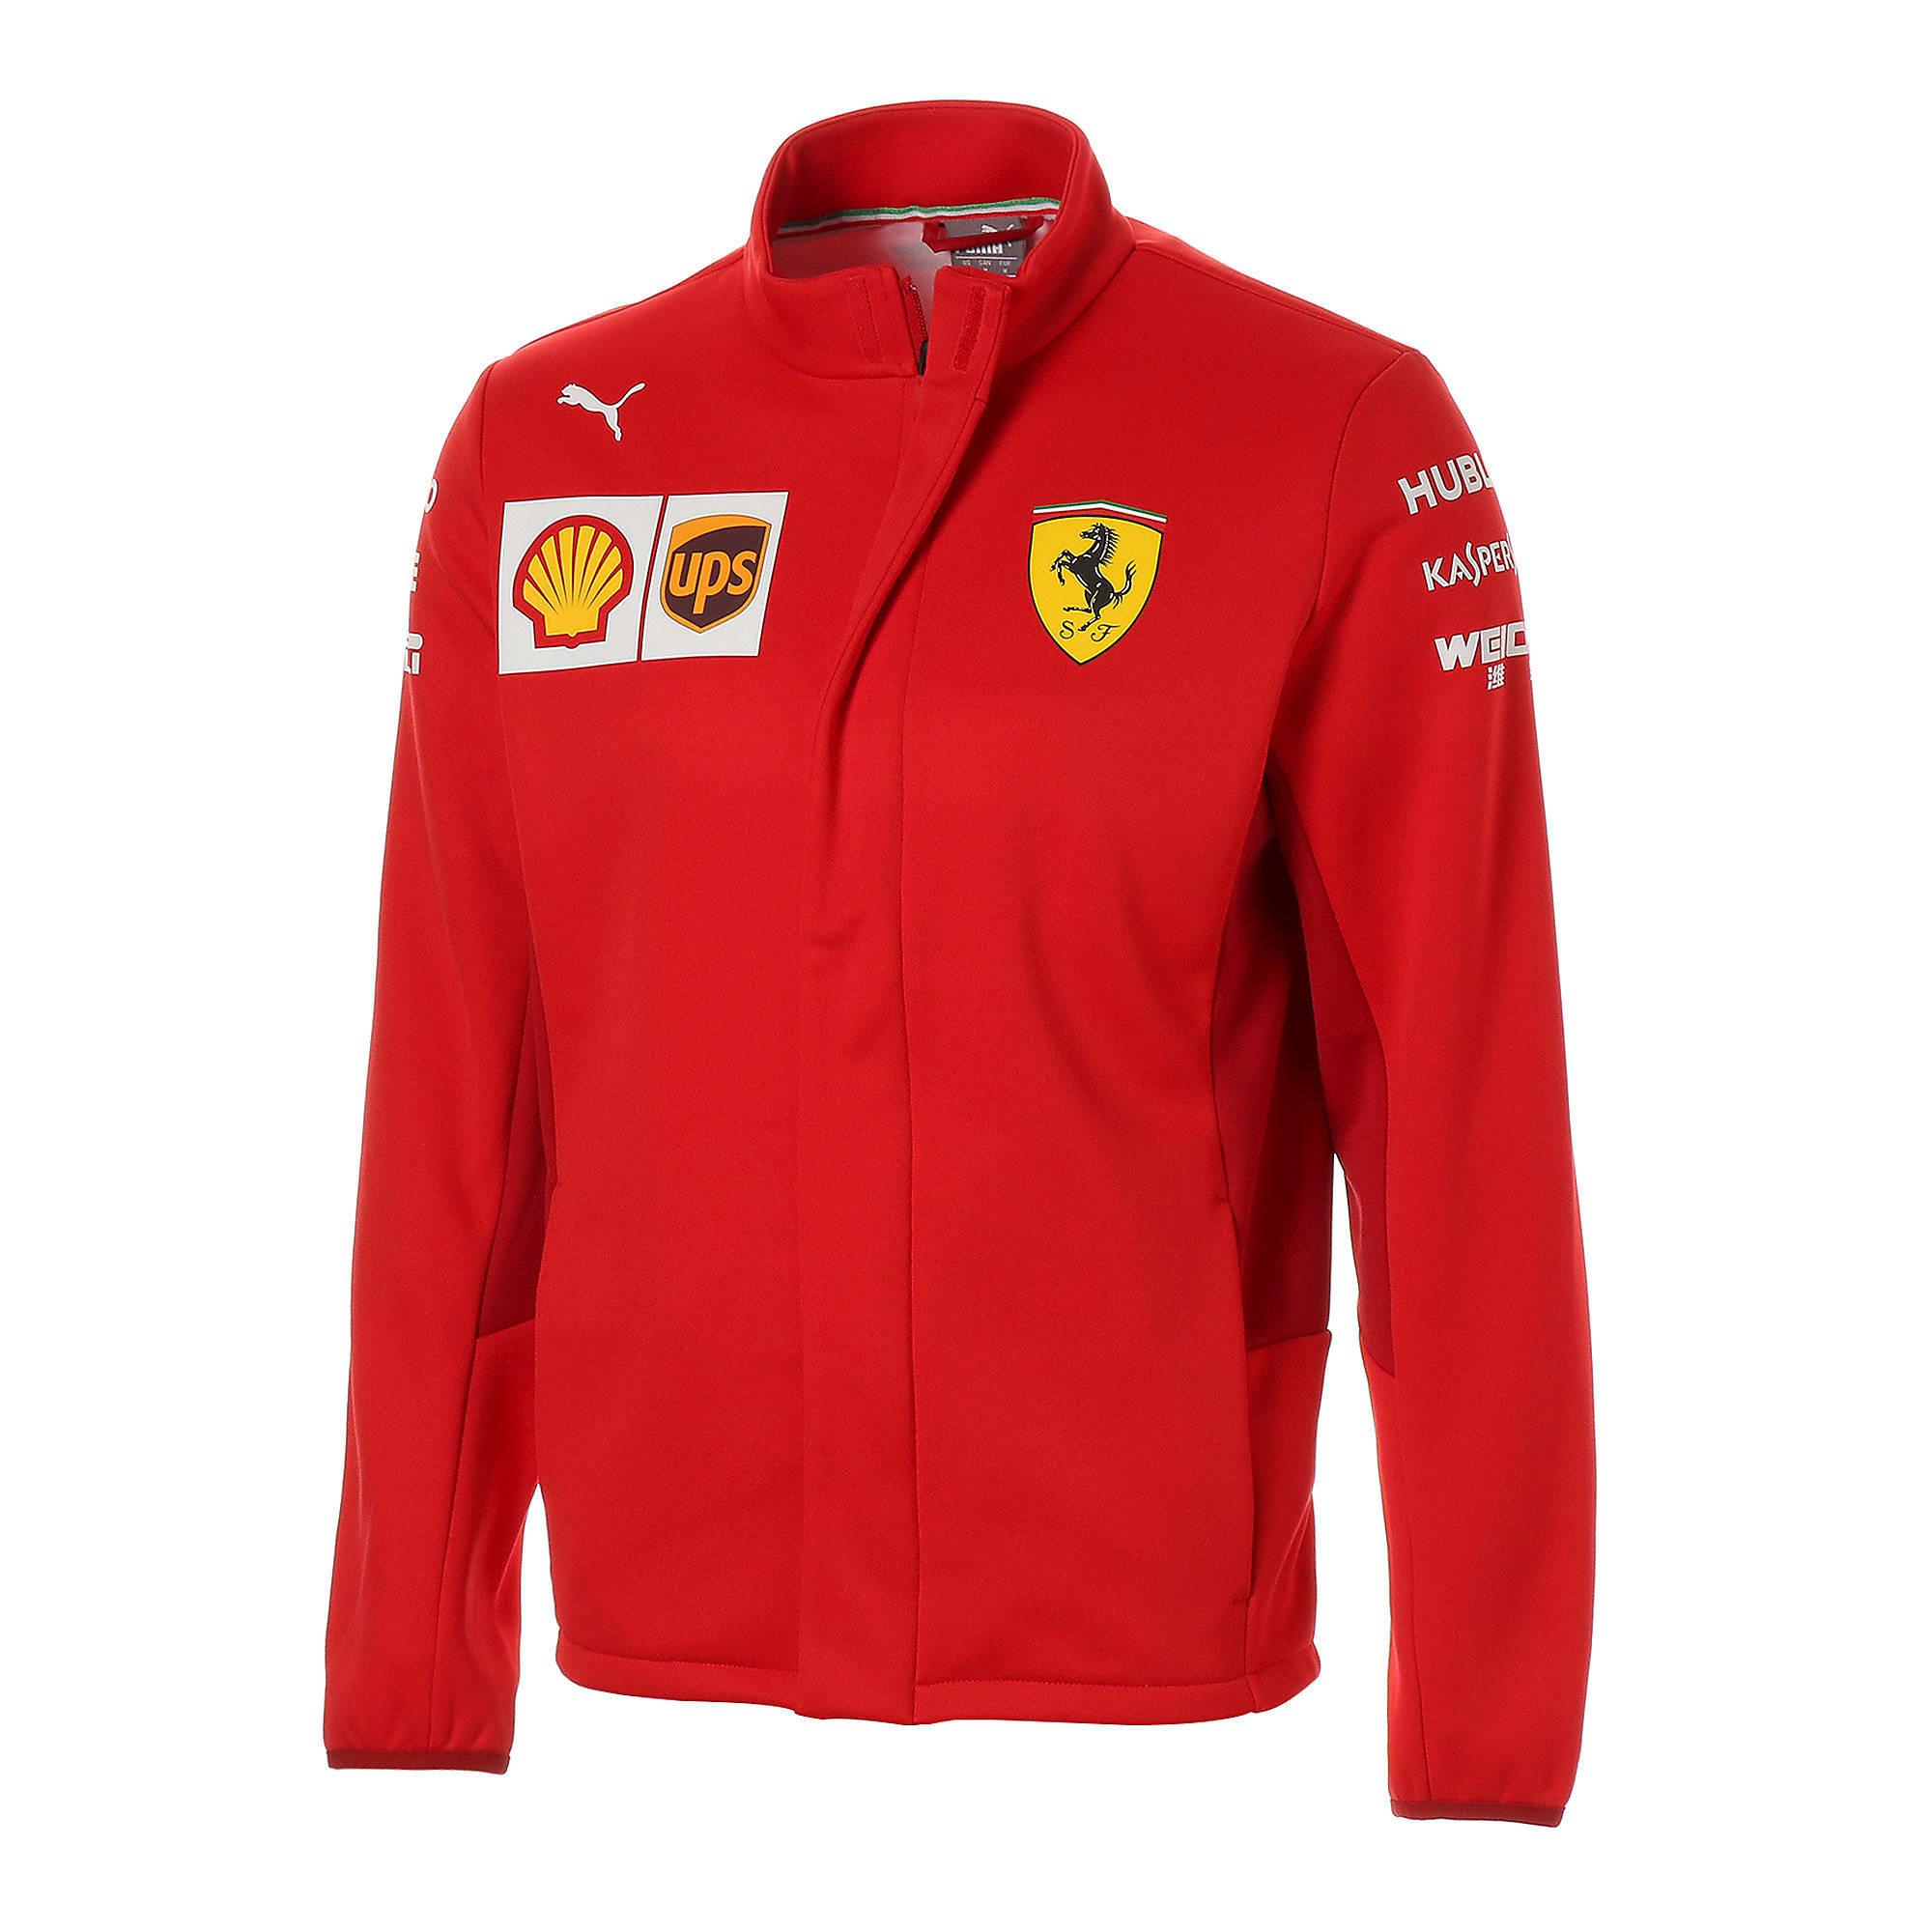 Thumbnail 1 of フェラーリ SF チーム ソフトシェル ジャケット, Rosso Corsa-without MW Logo, medium-JPN